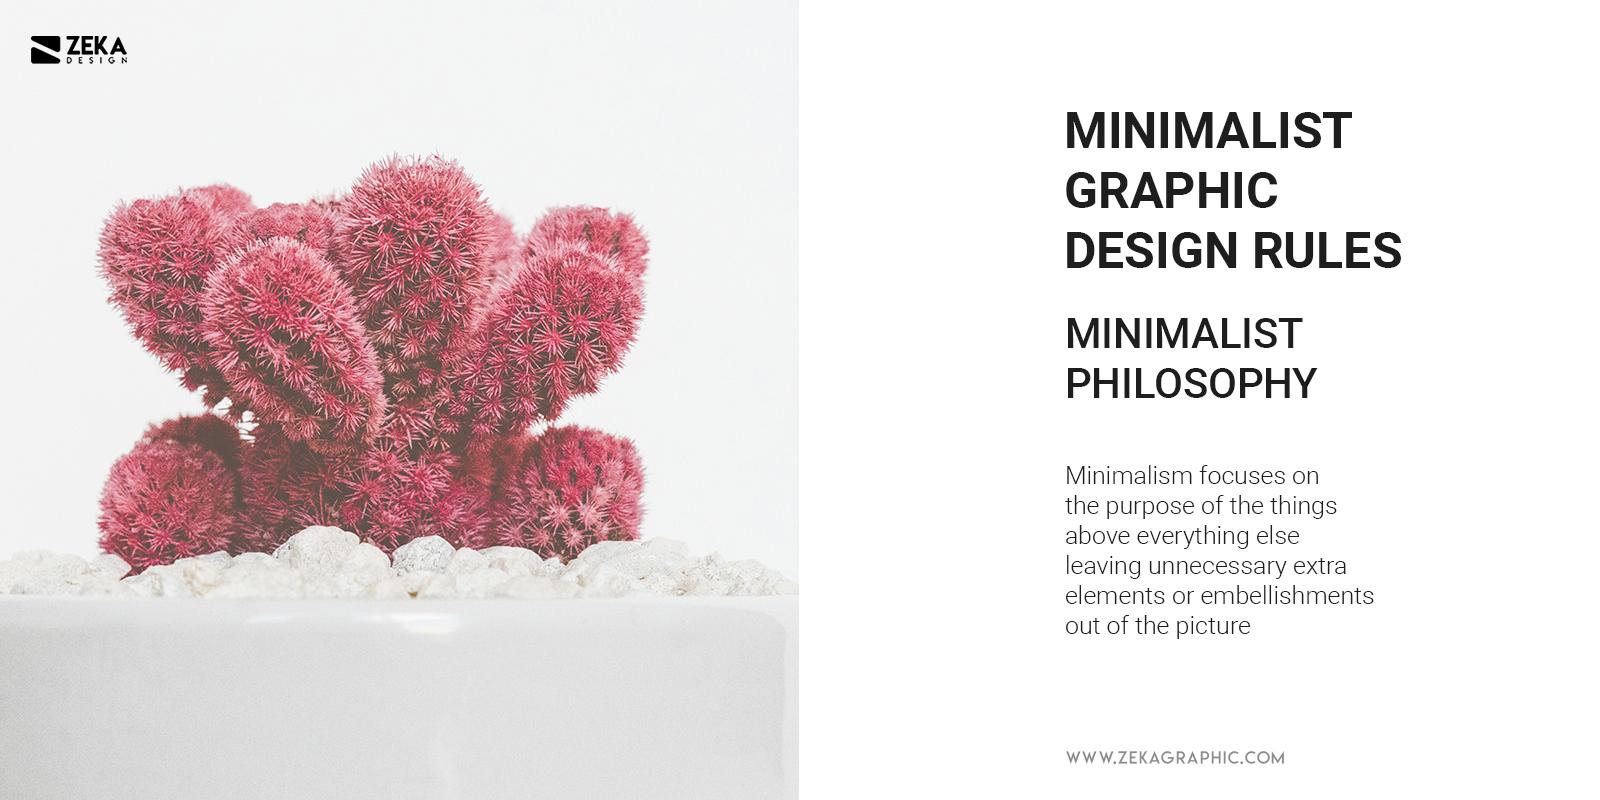 Minimalist Philosophy in Graphic Design